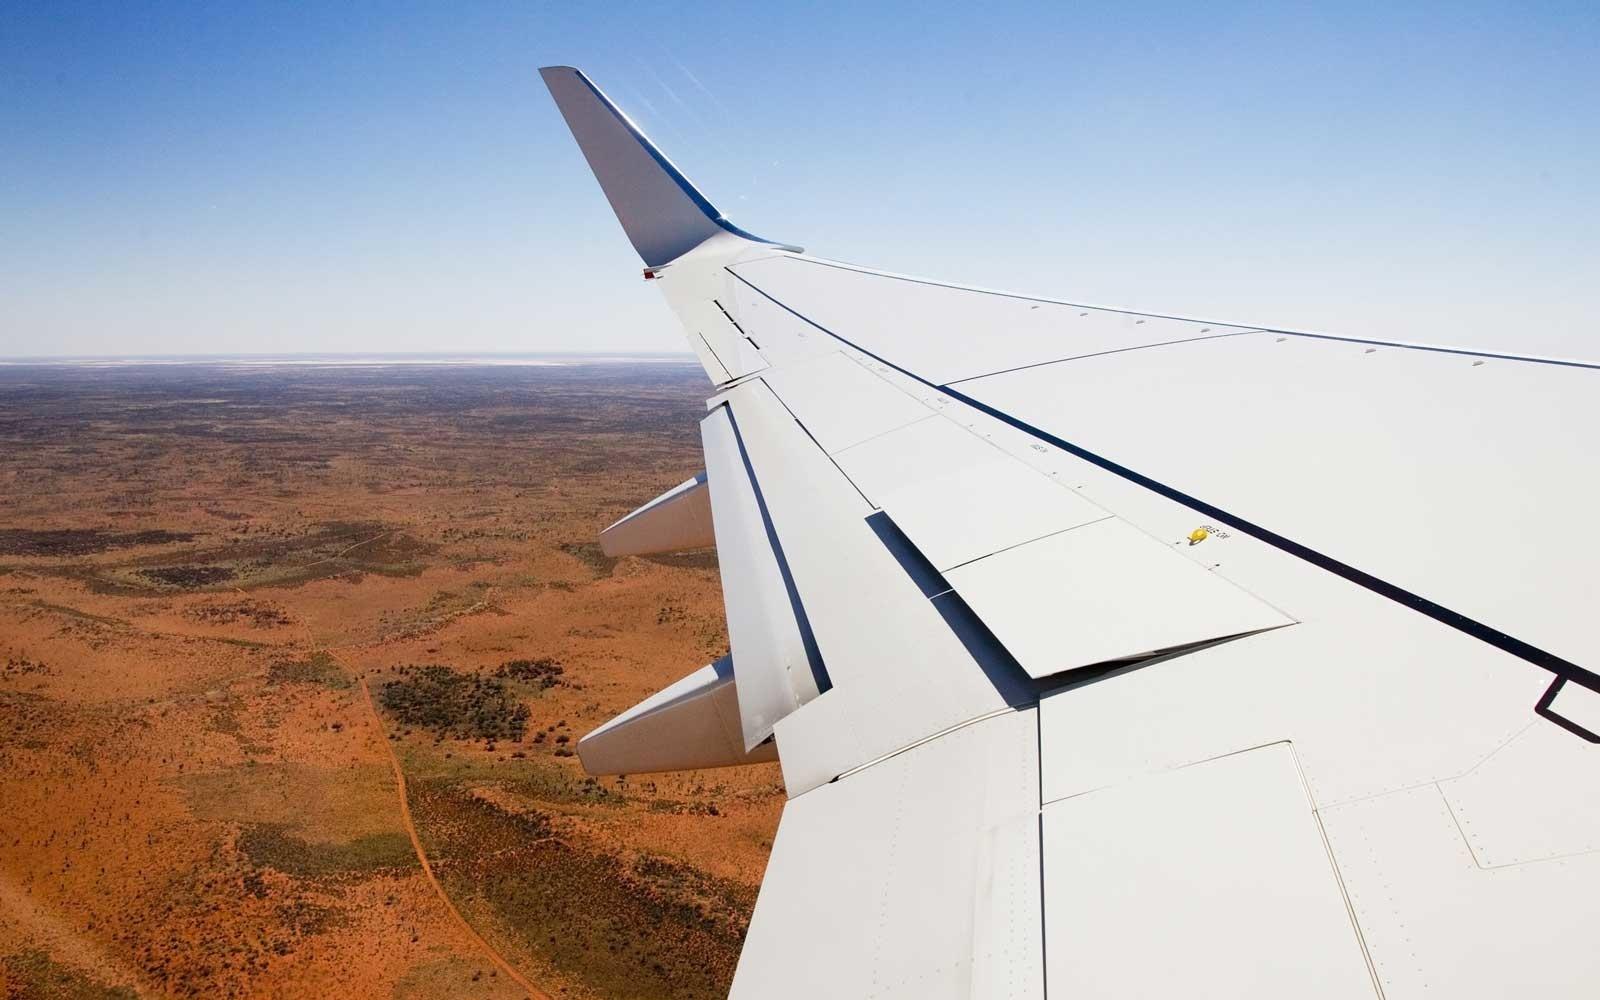 airplane-wing-australia-PROFITROUTE0718